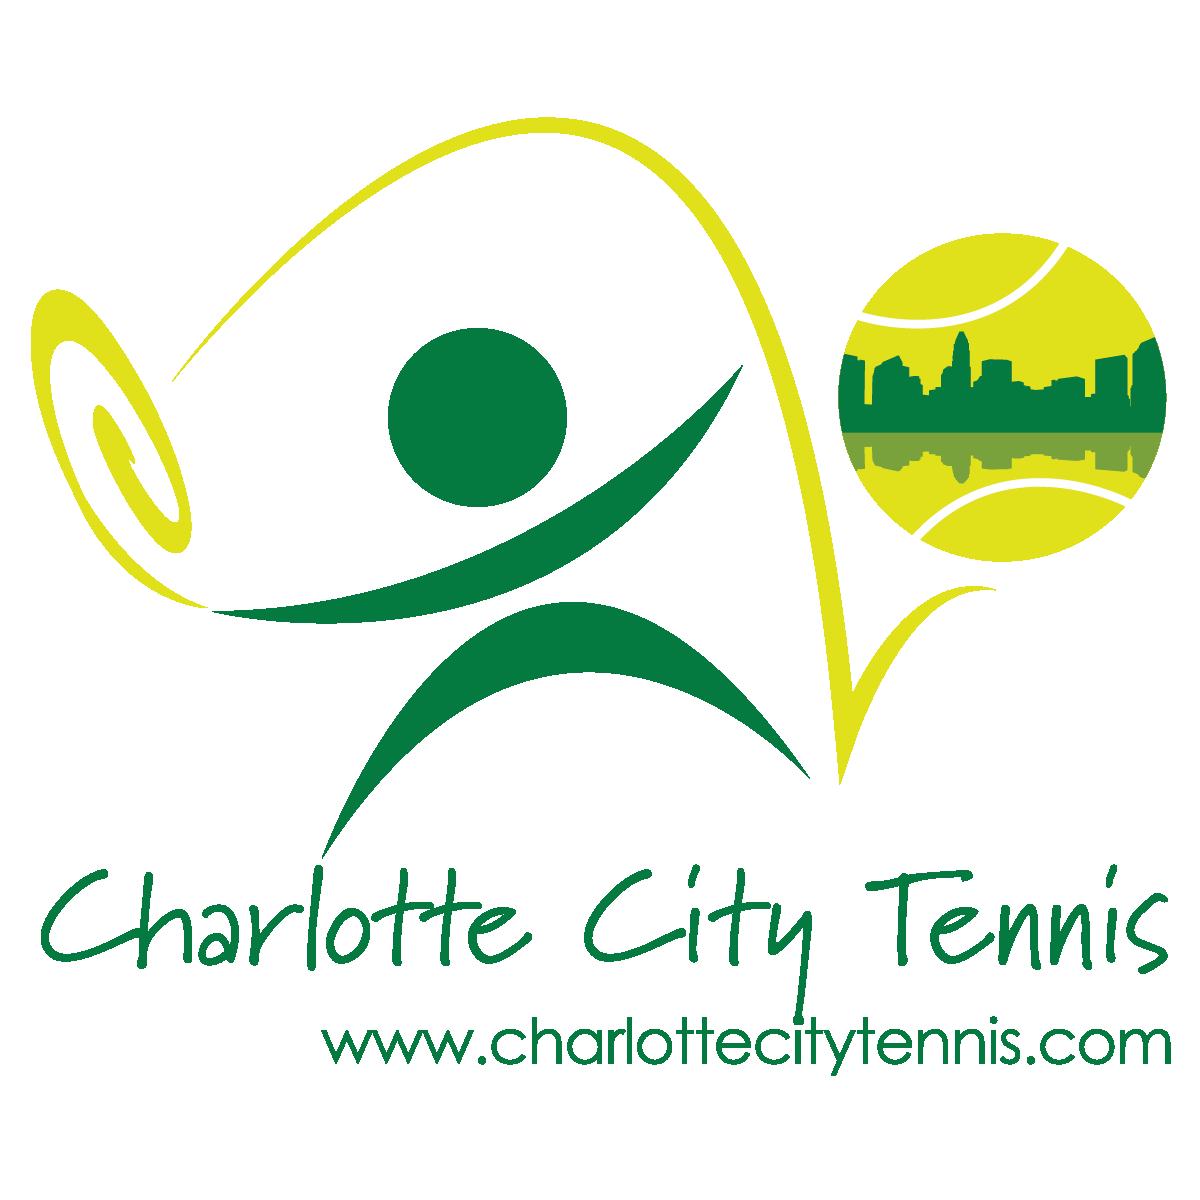 Charlotte City Tennis